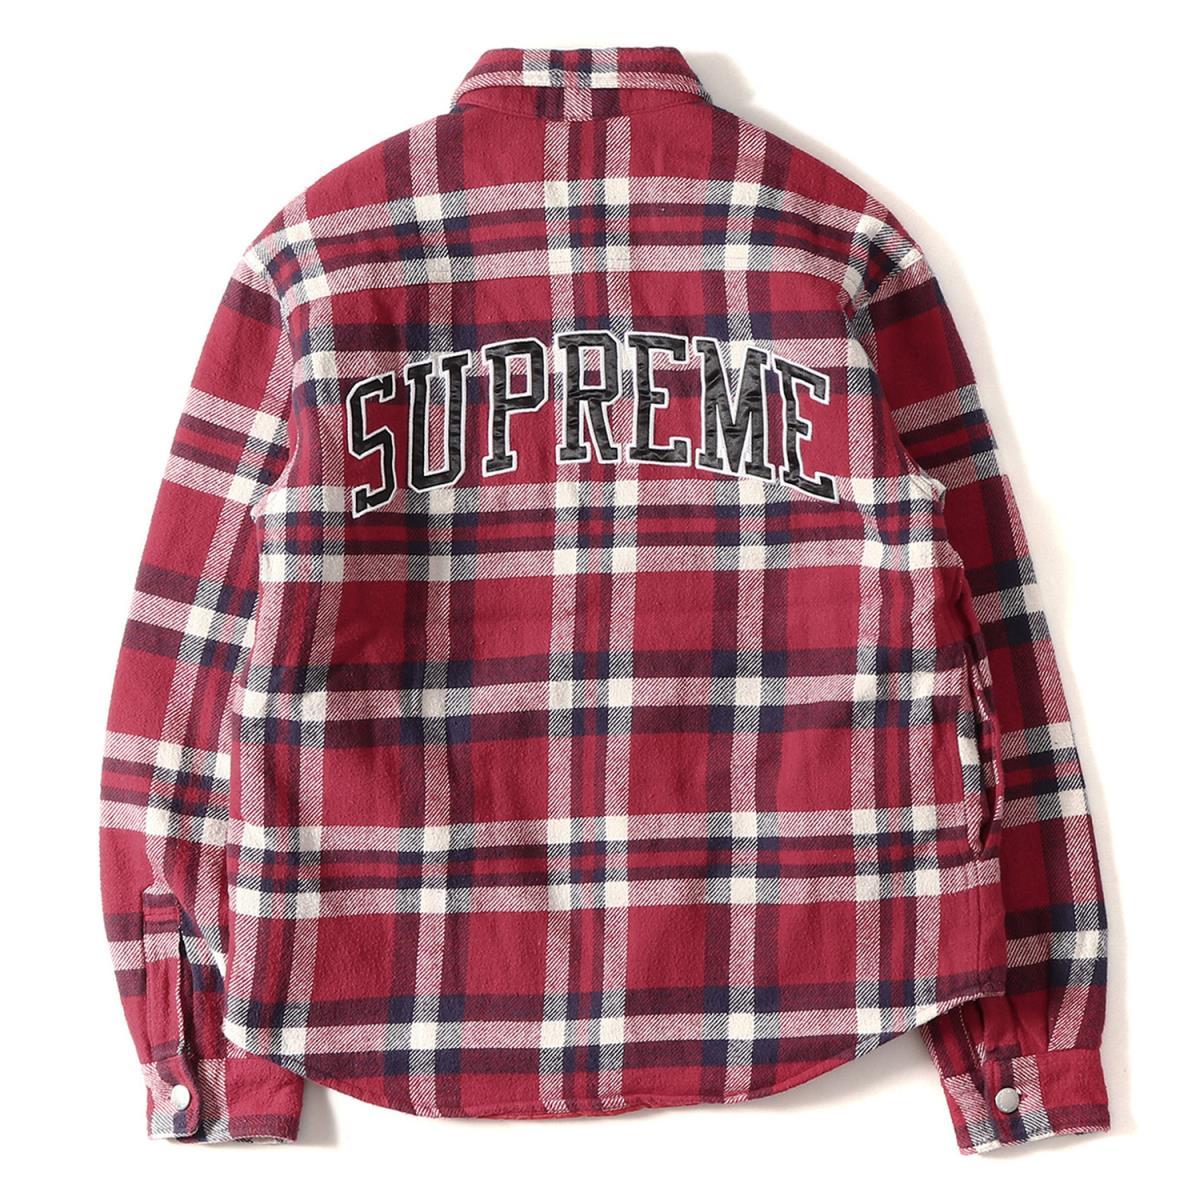 Supreme (シュプリーム) 17A/W キルティング付きアーチロゴチェックネルシャツ(Quilted Arc Logo Flannel Shirt) レッド S 【美品】【メンズ】【K2076】【中古】【あす楽☆対応可】